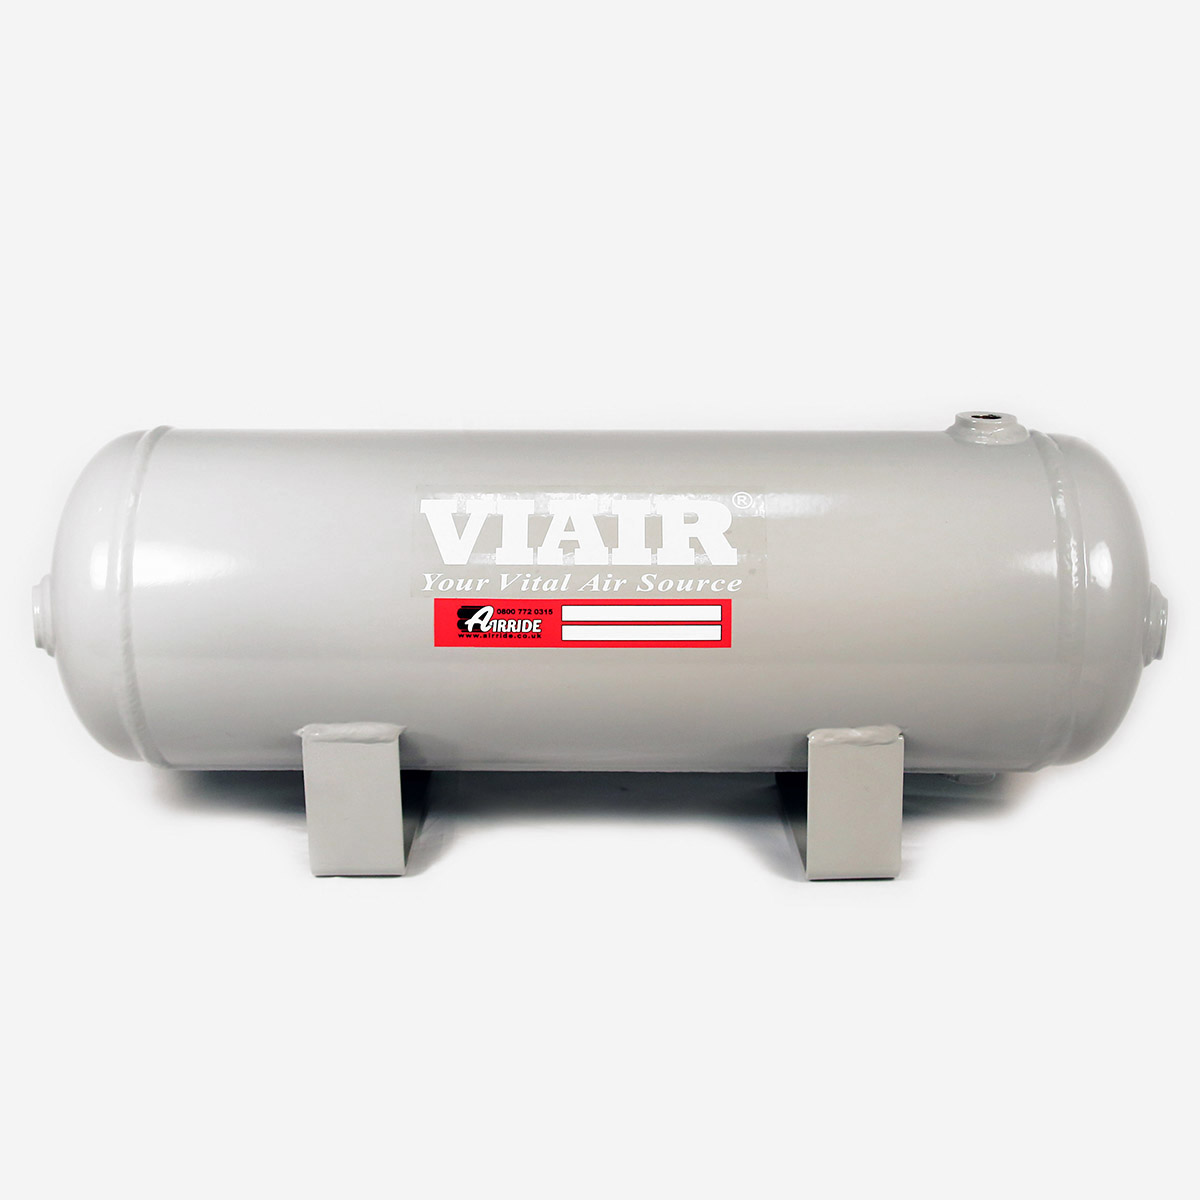 "Viair 91022 2.0 Gallon Air Tank Six 1//4/"" NPT Ports; 150 PSI Rated"